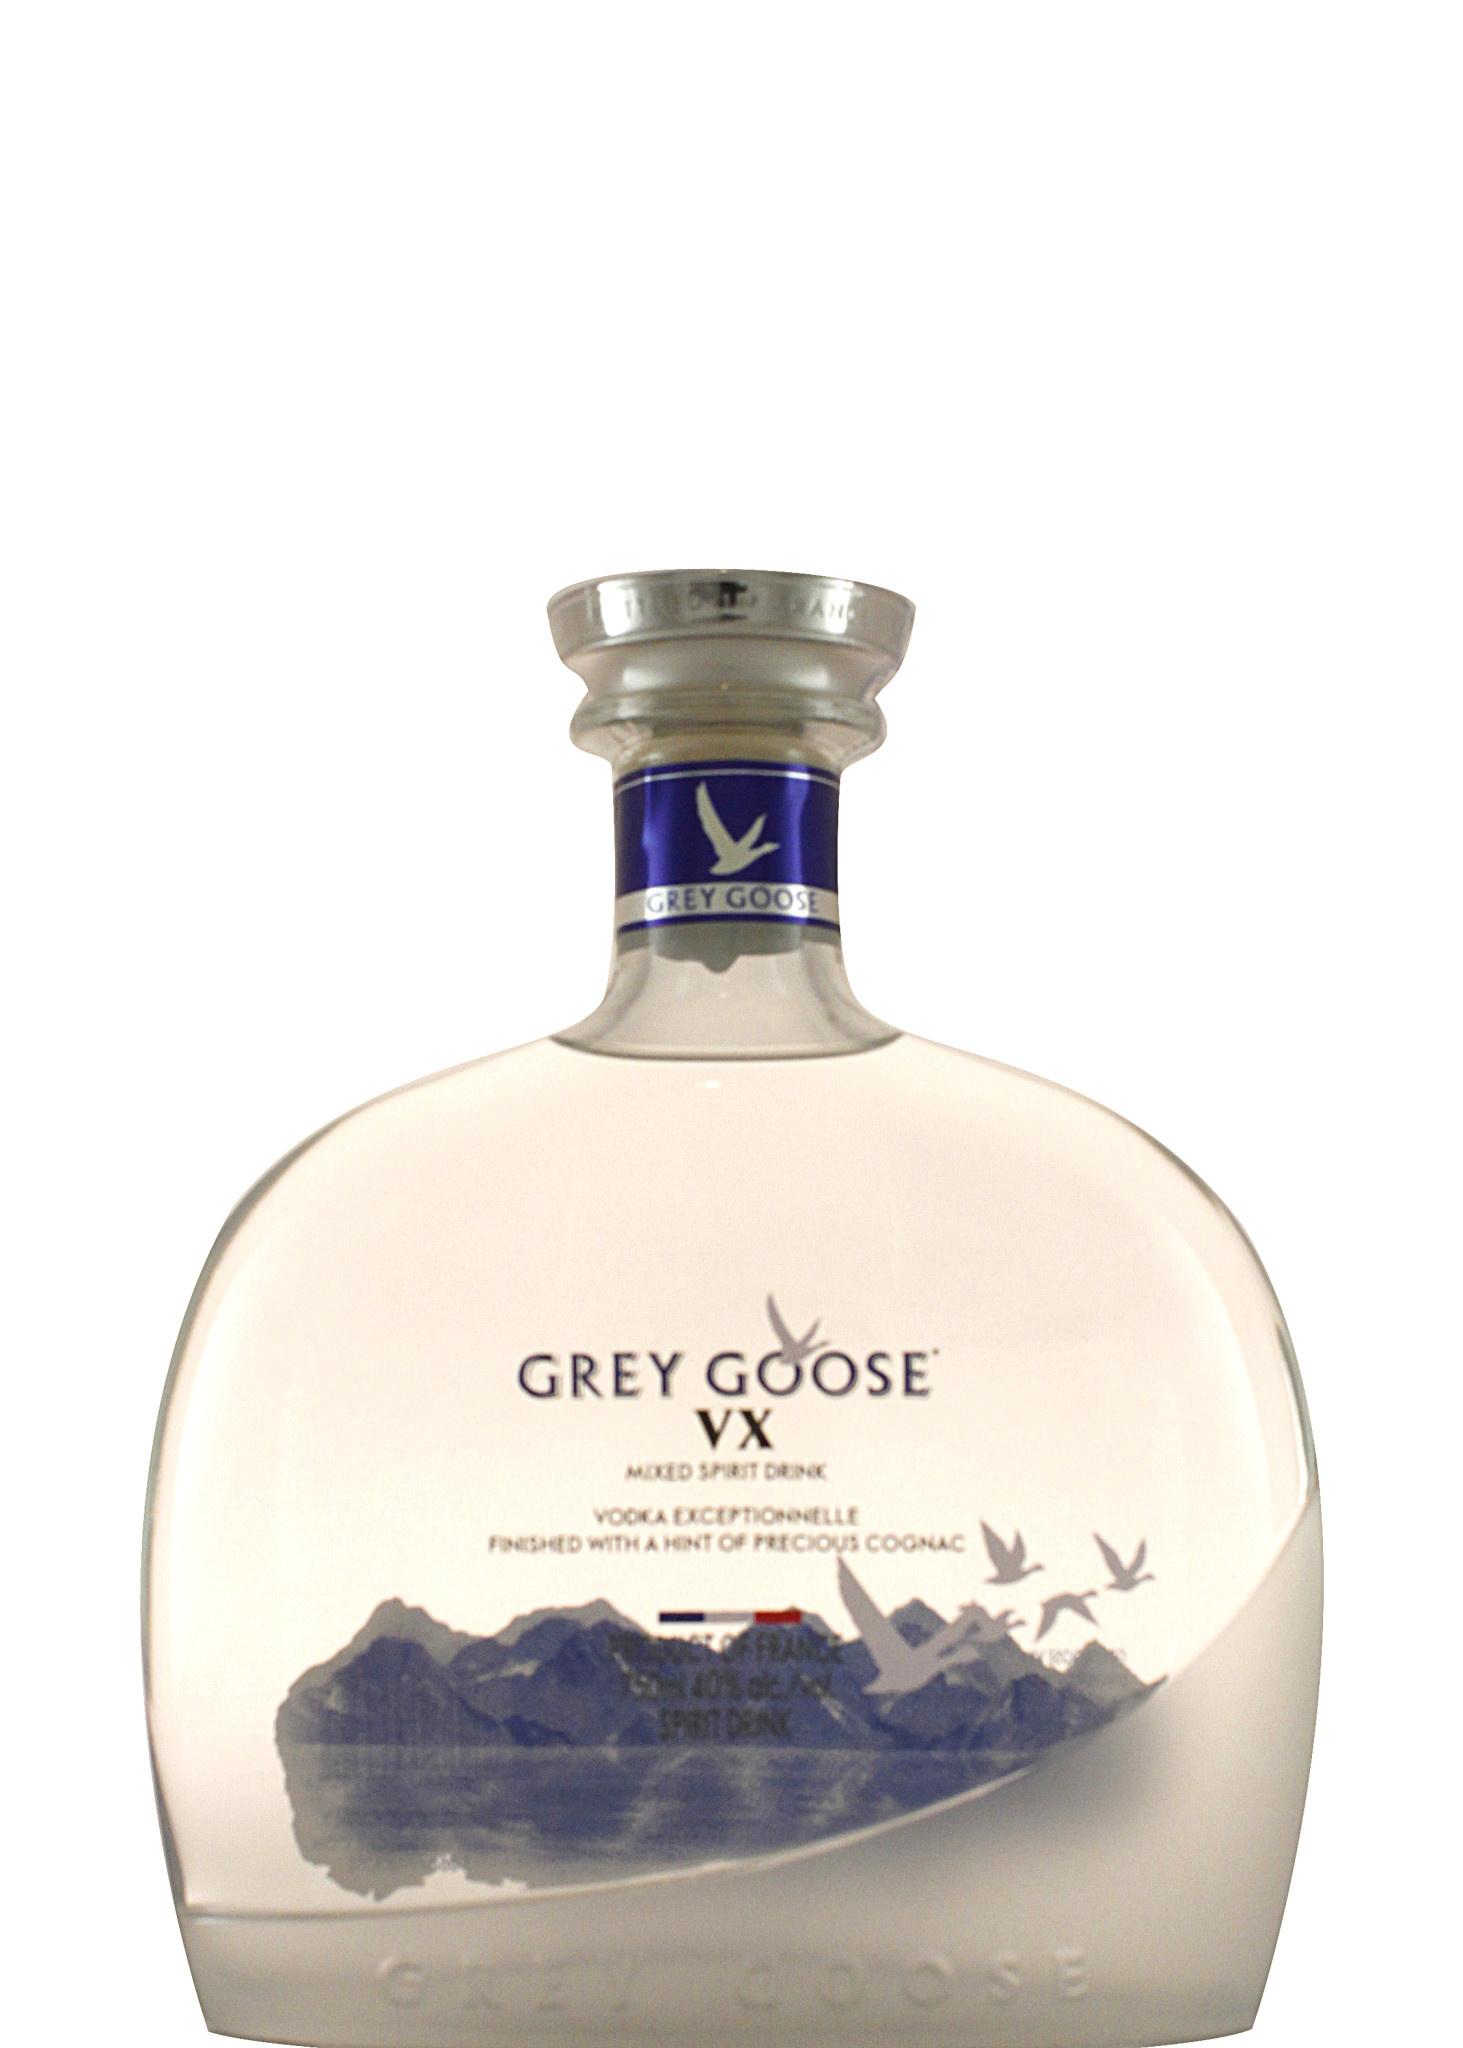 Grey Goose VX Vodka, France